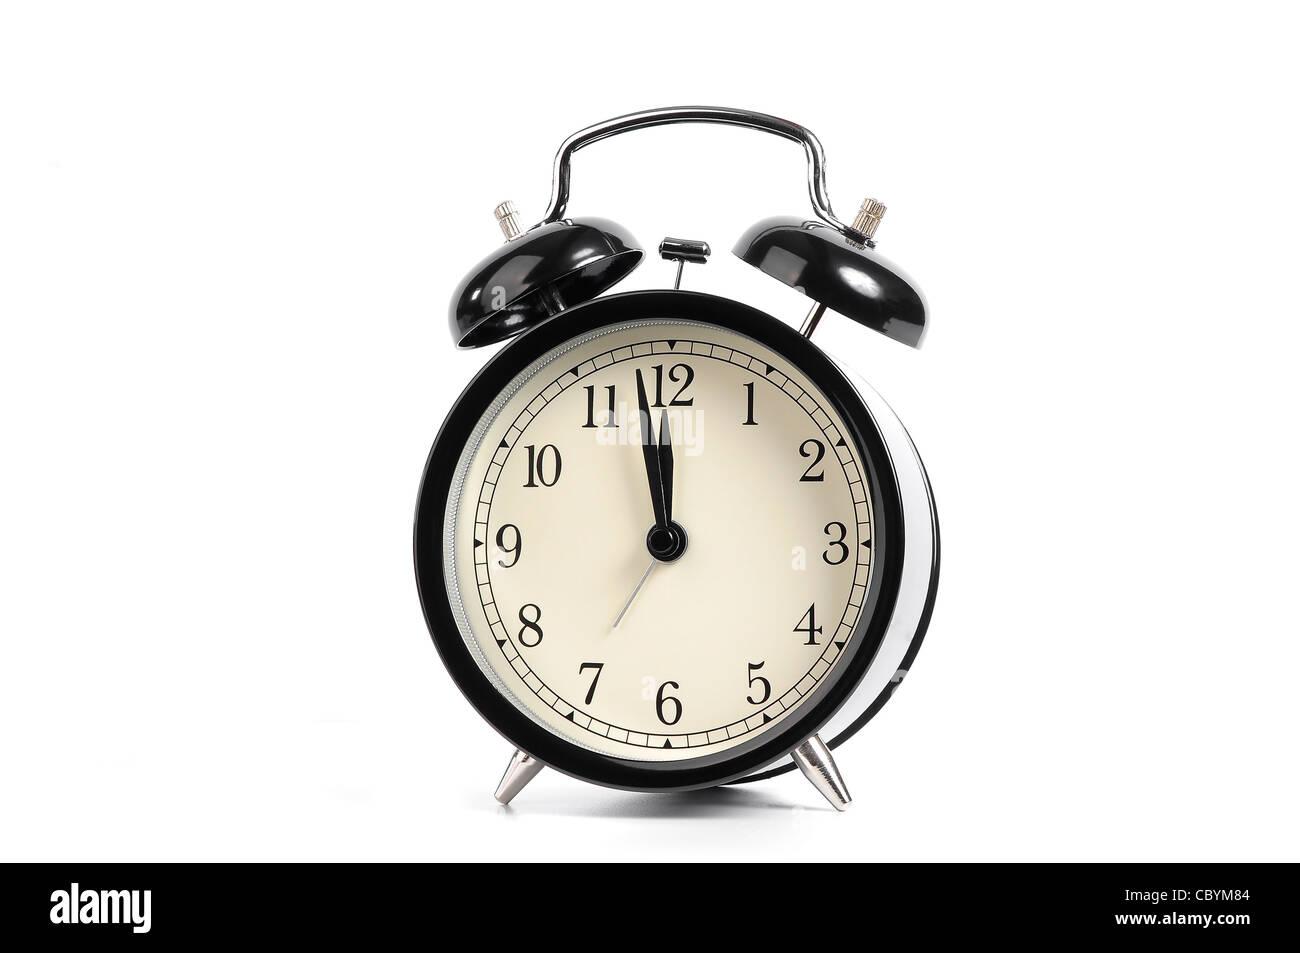 Antiguo reloj despertador negro aislado sobre un fondo blanco. Imagen De Stock